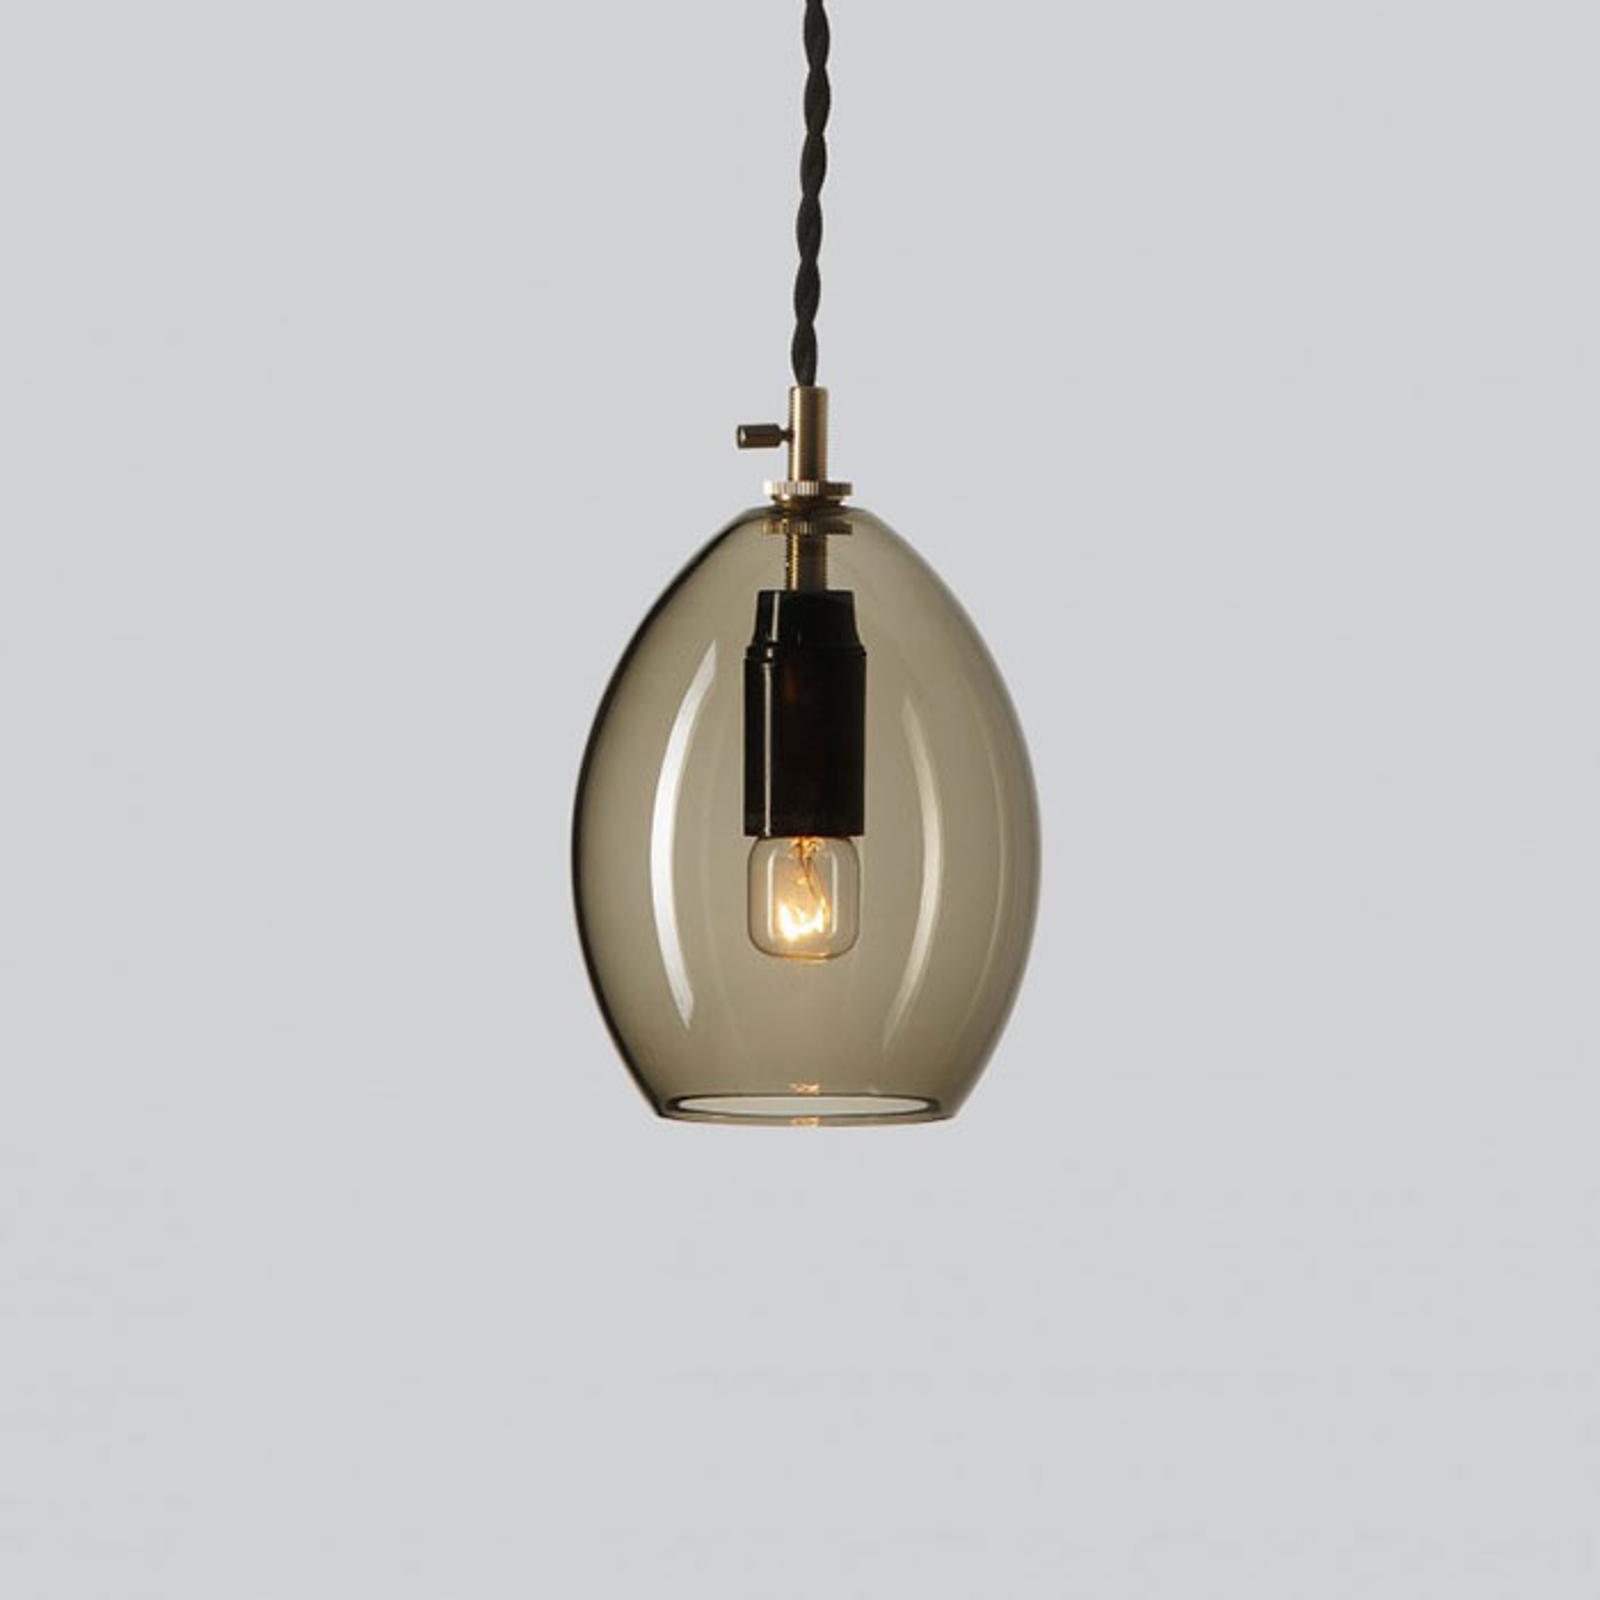 Northern Unika hanglamp rookgrijs, small